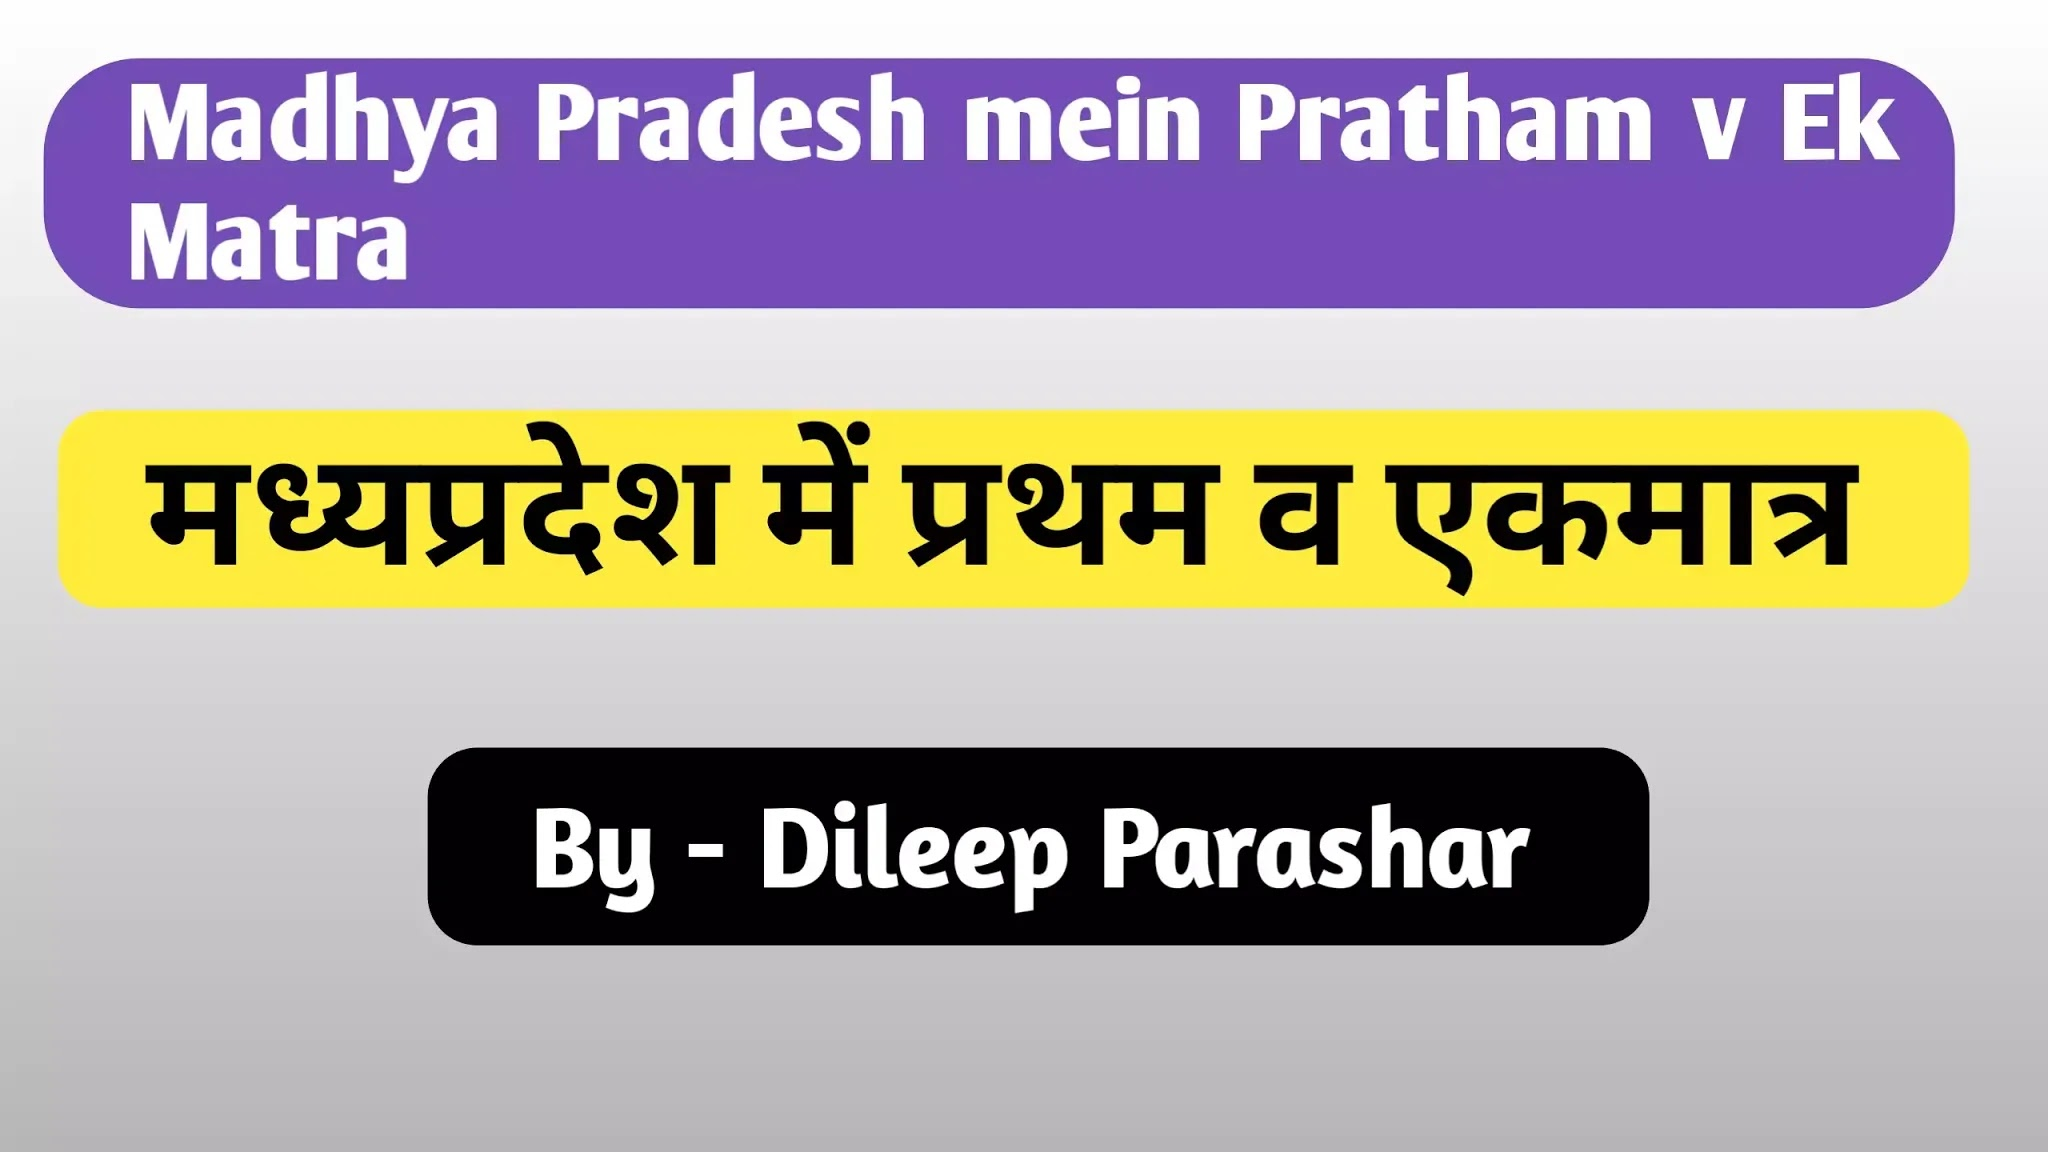 MP GK : Madhya Pradesh mein Pratham v Ek Matra|| मध्यप्रदेश में प्रथम व एकमात्र